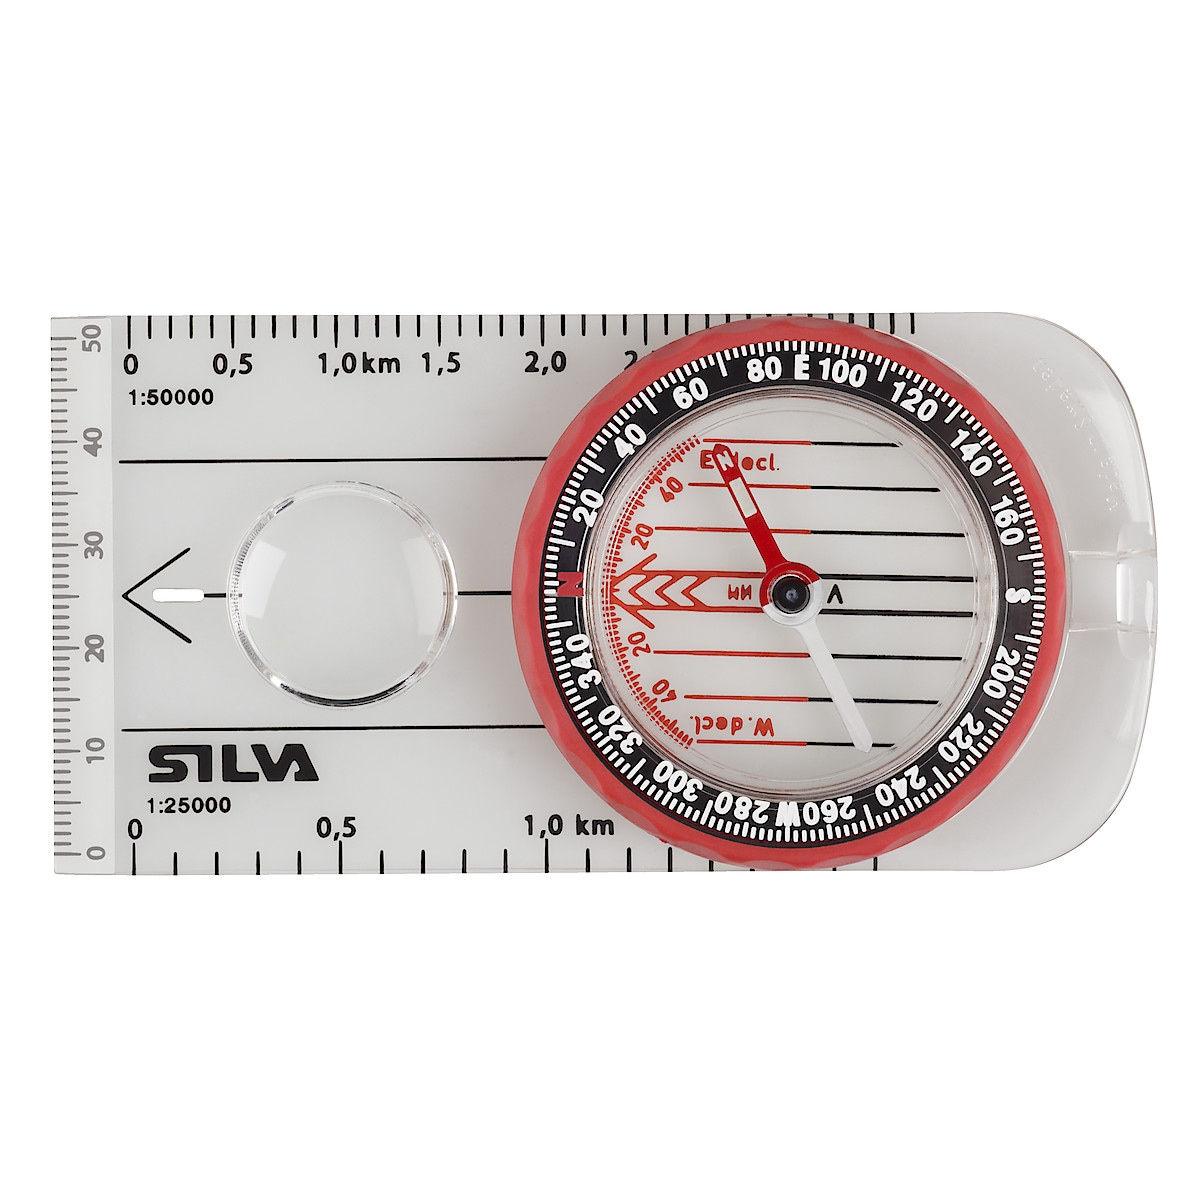 Kompass Silva Ranger 3